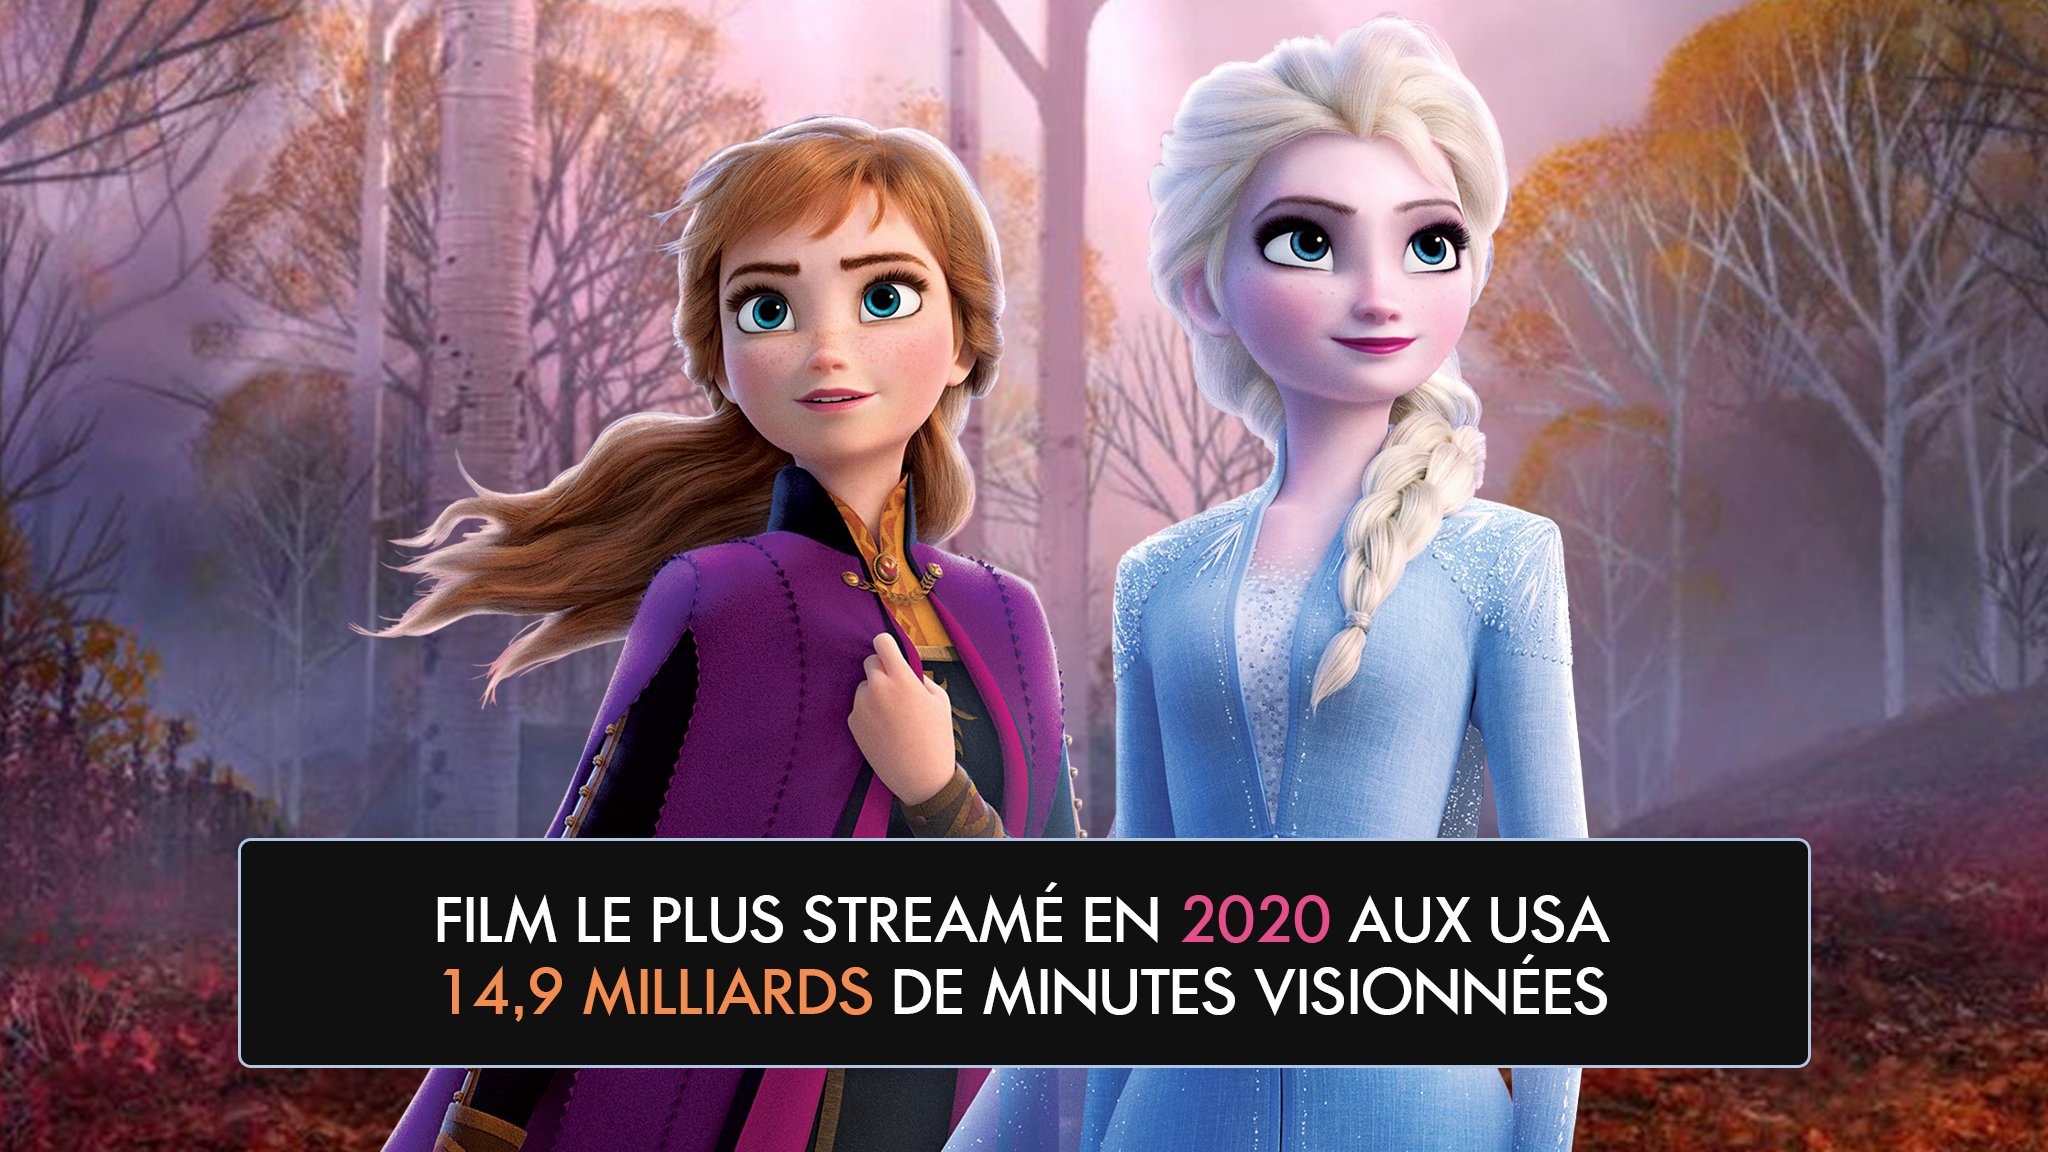 La Reine des Neiges II [Walt Disney - 2019] - Page 31 ErpDfPdXYAALY-r?format=jpg&name=large